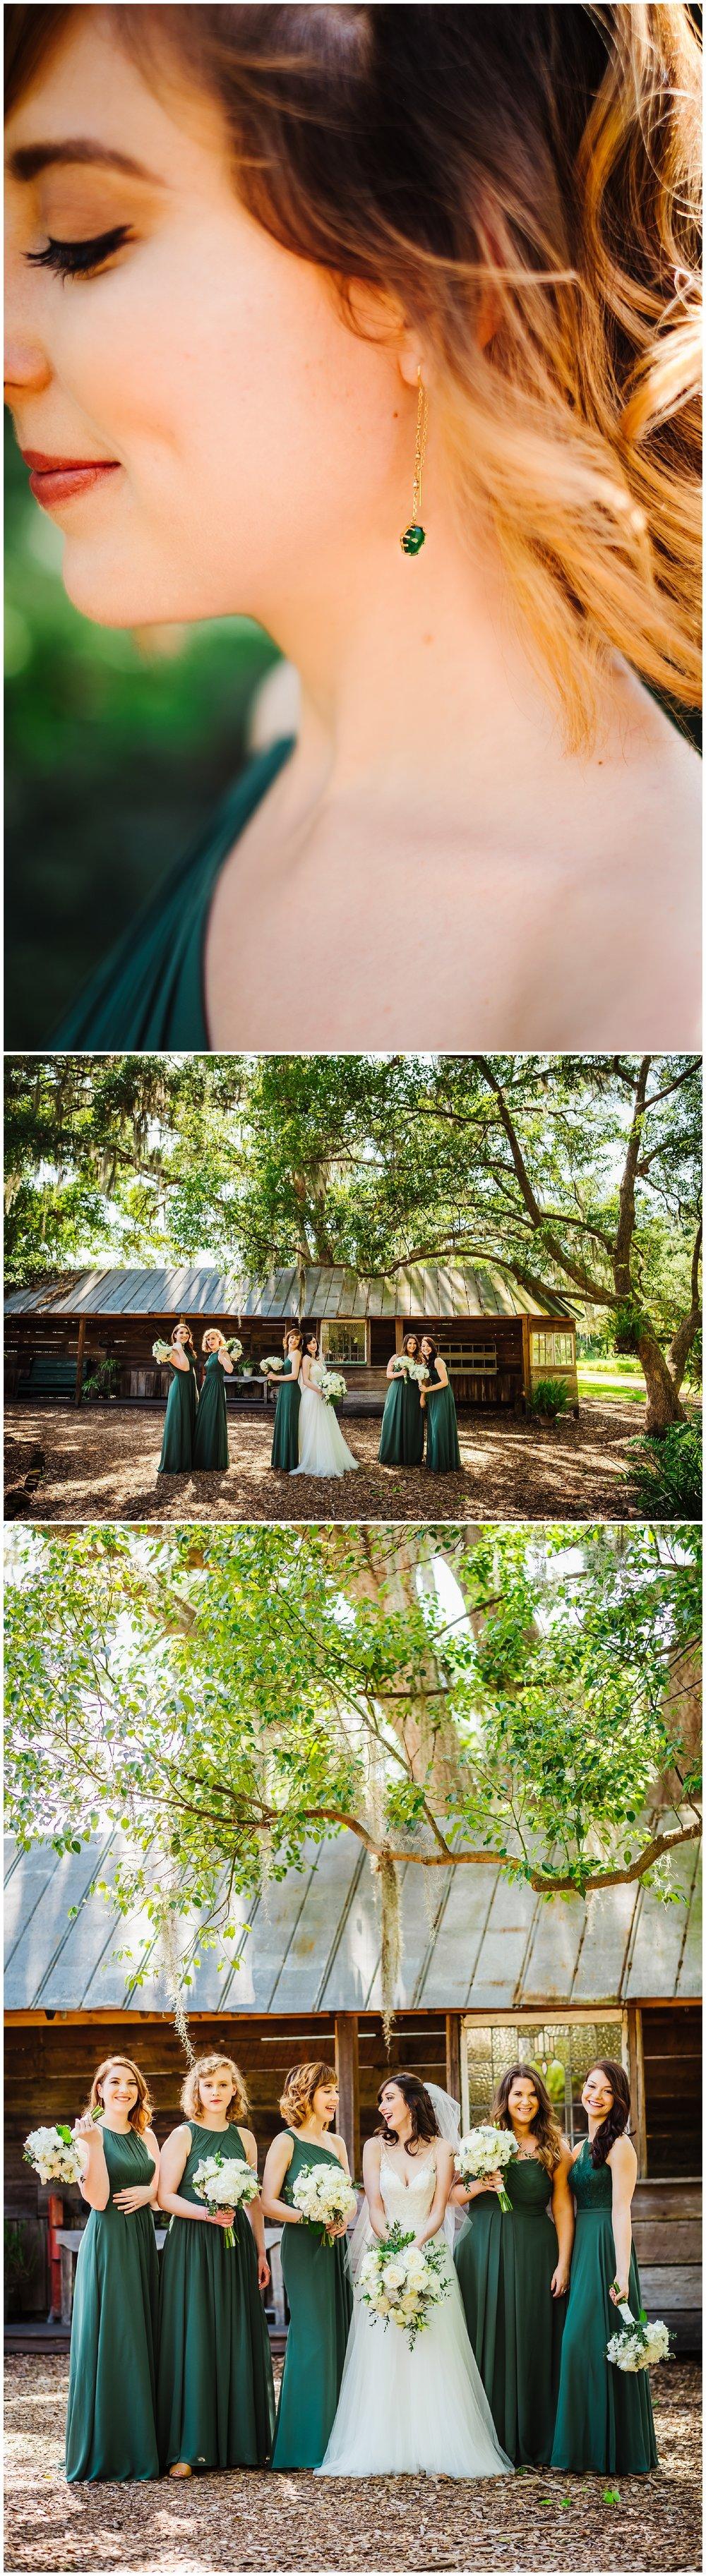 cross-creek-ranch-tampa-wedding-photographer-lush-green-white-florals_0017.jpg